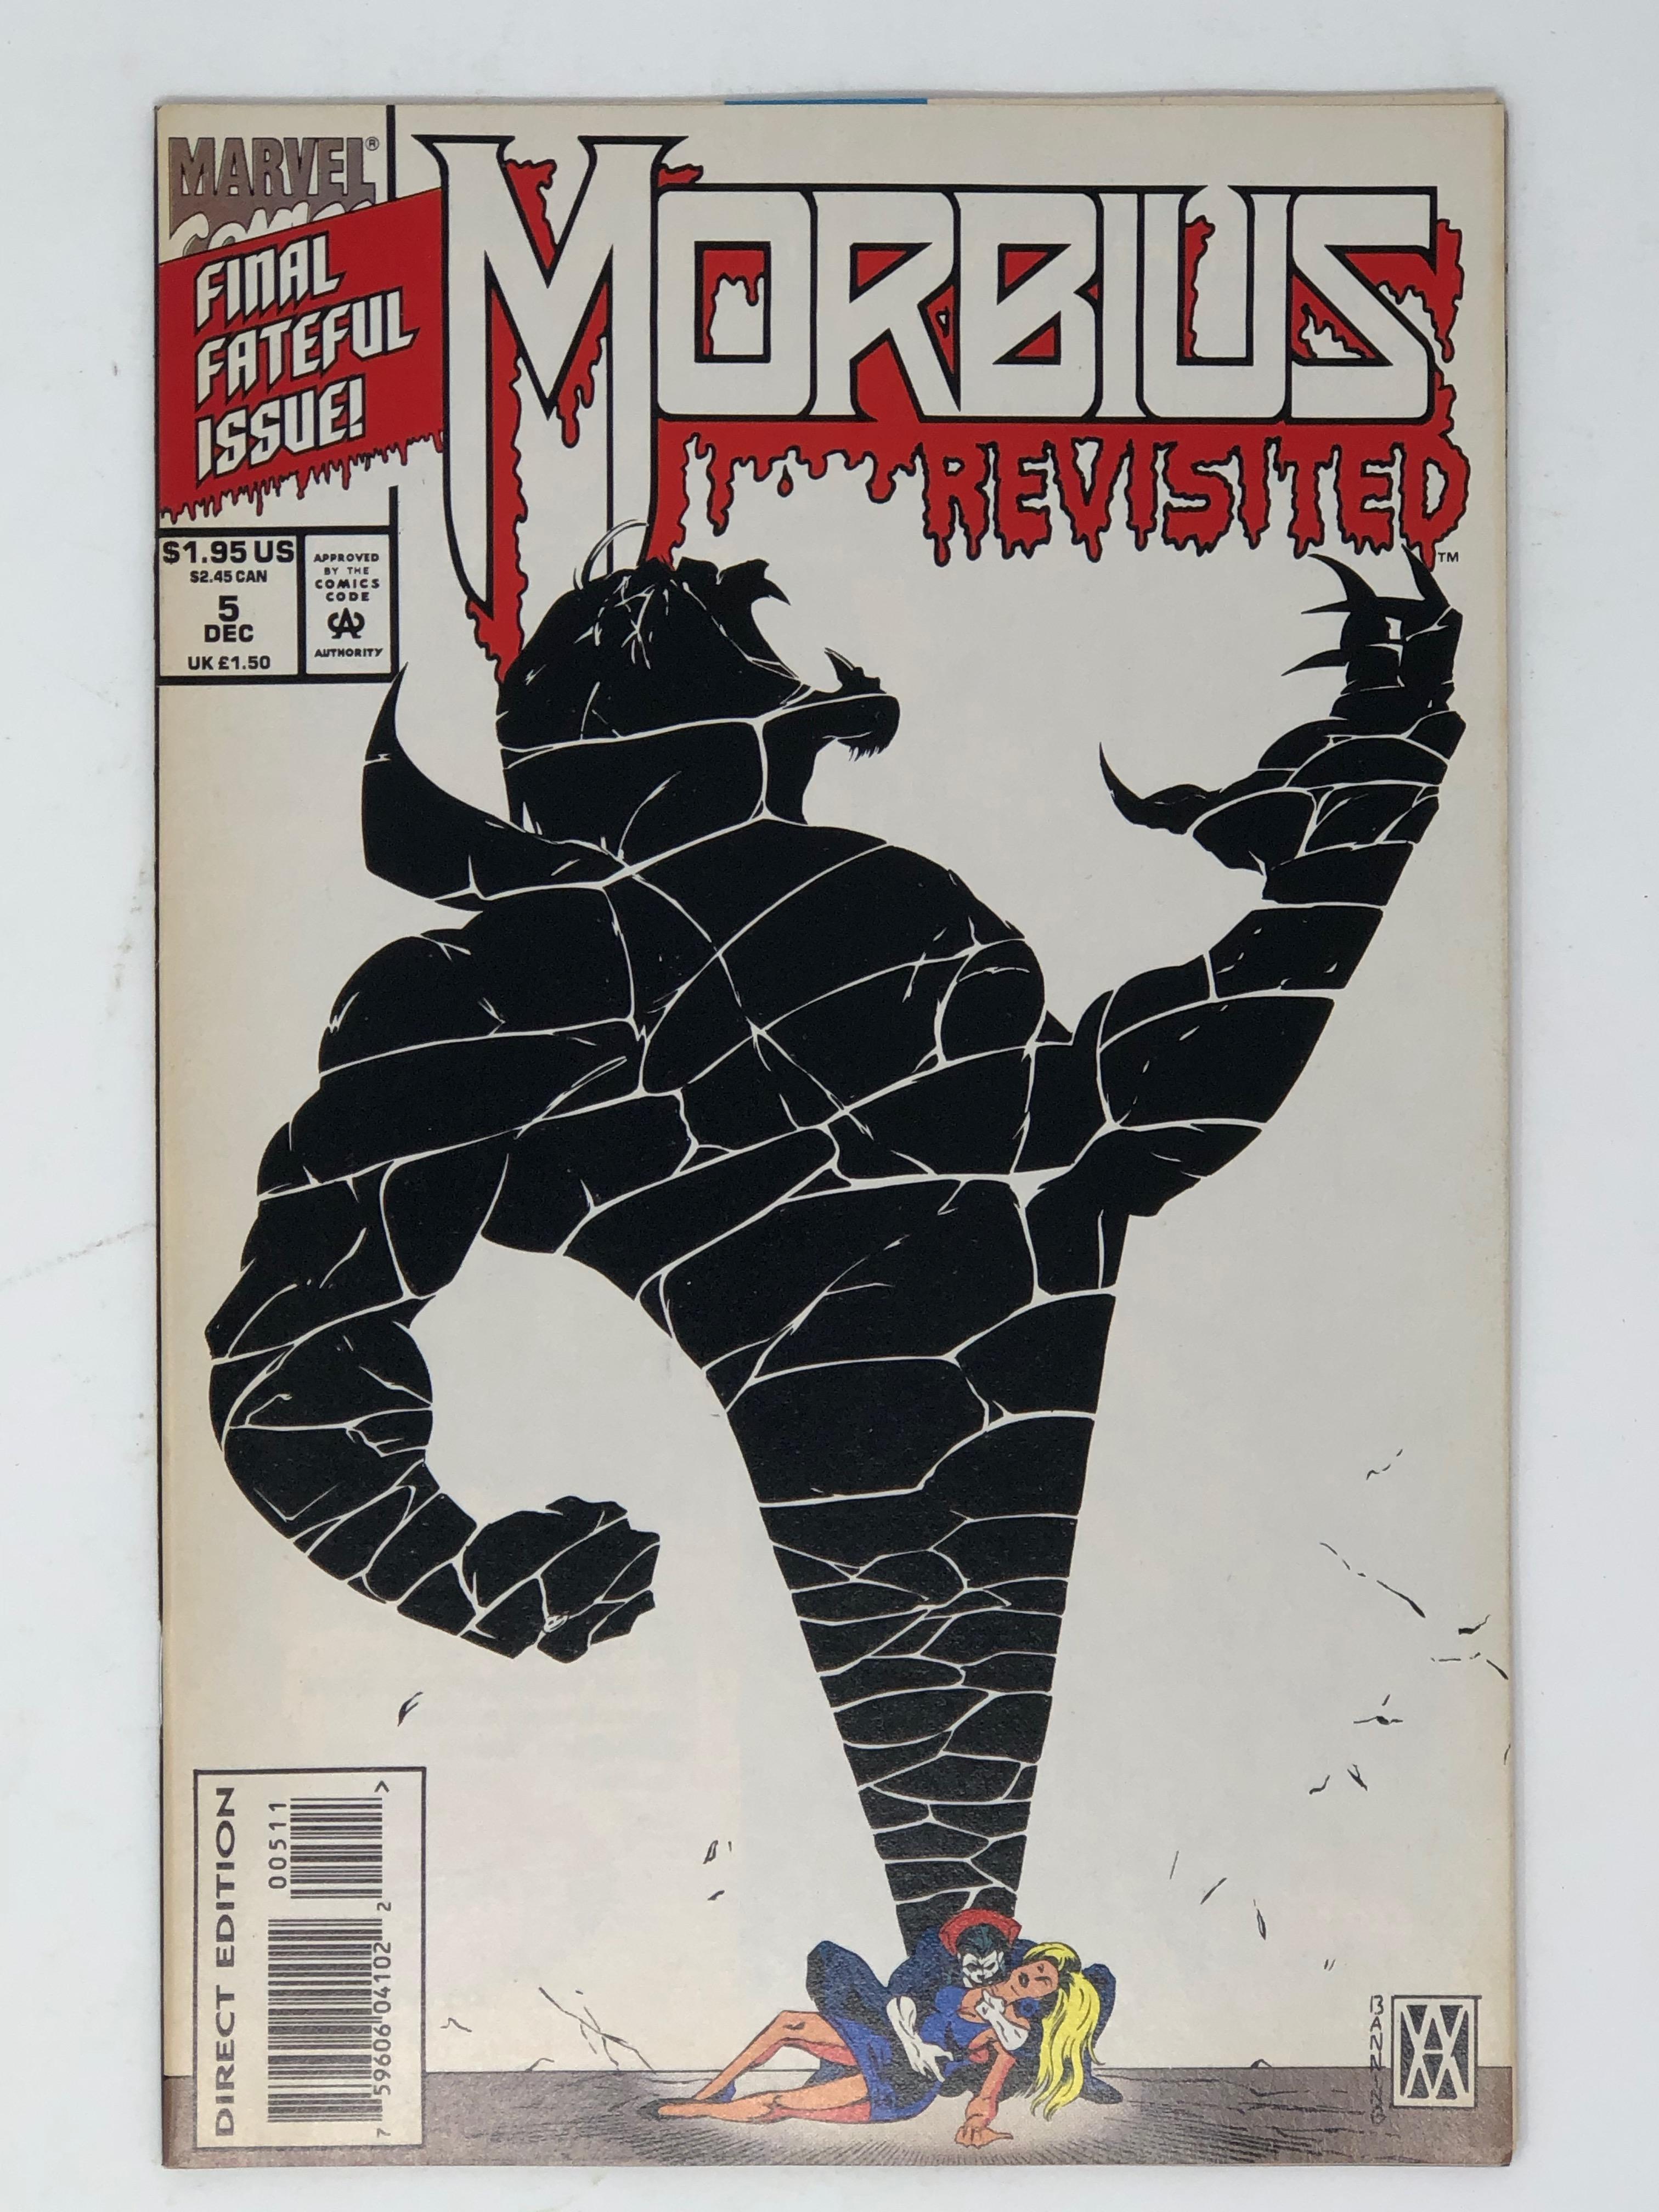 MARVEL, MORBIUS final fateful issue revisited 5